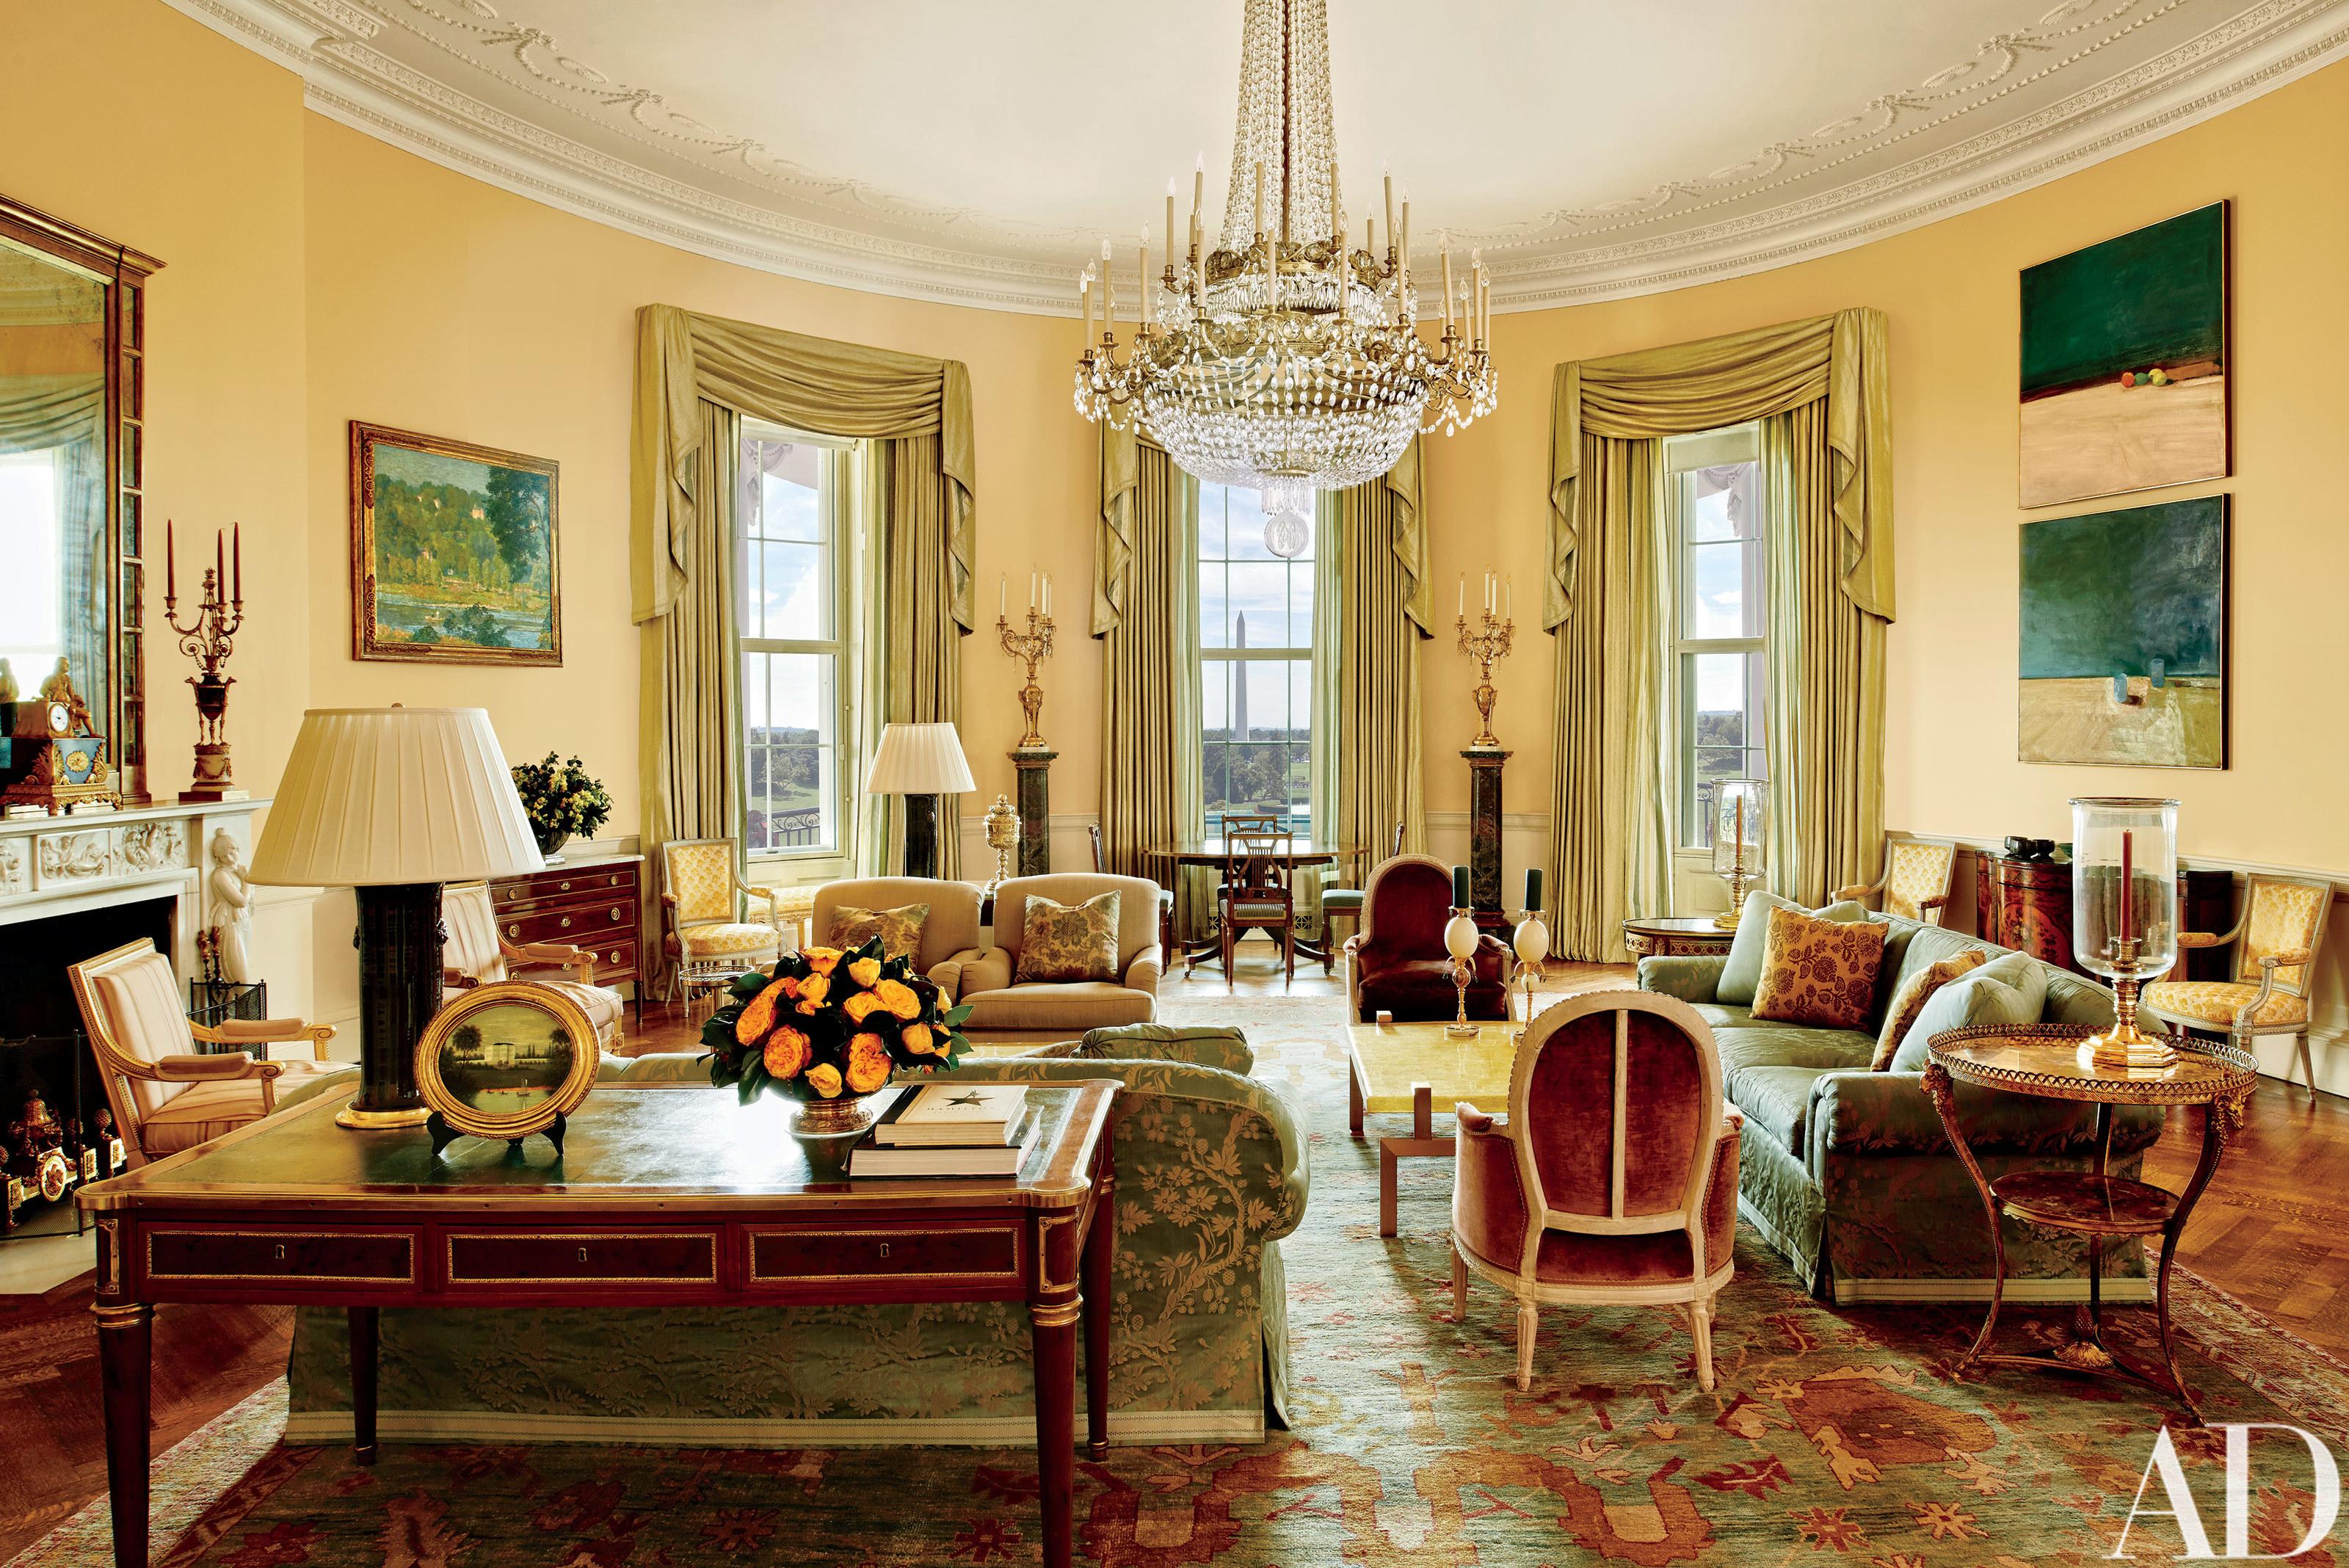 Washington - Obama Reveals Private Living Areas Of White House